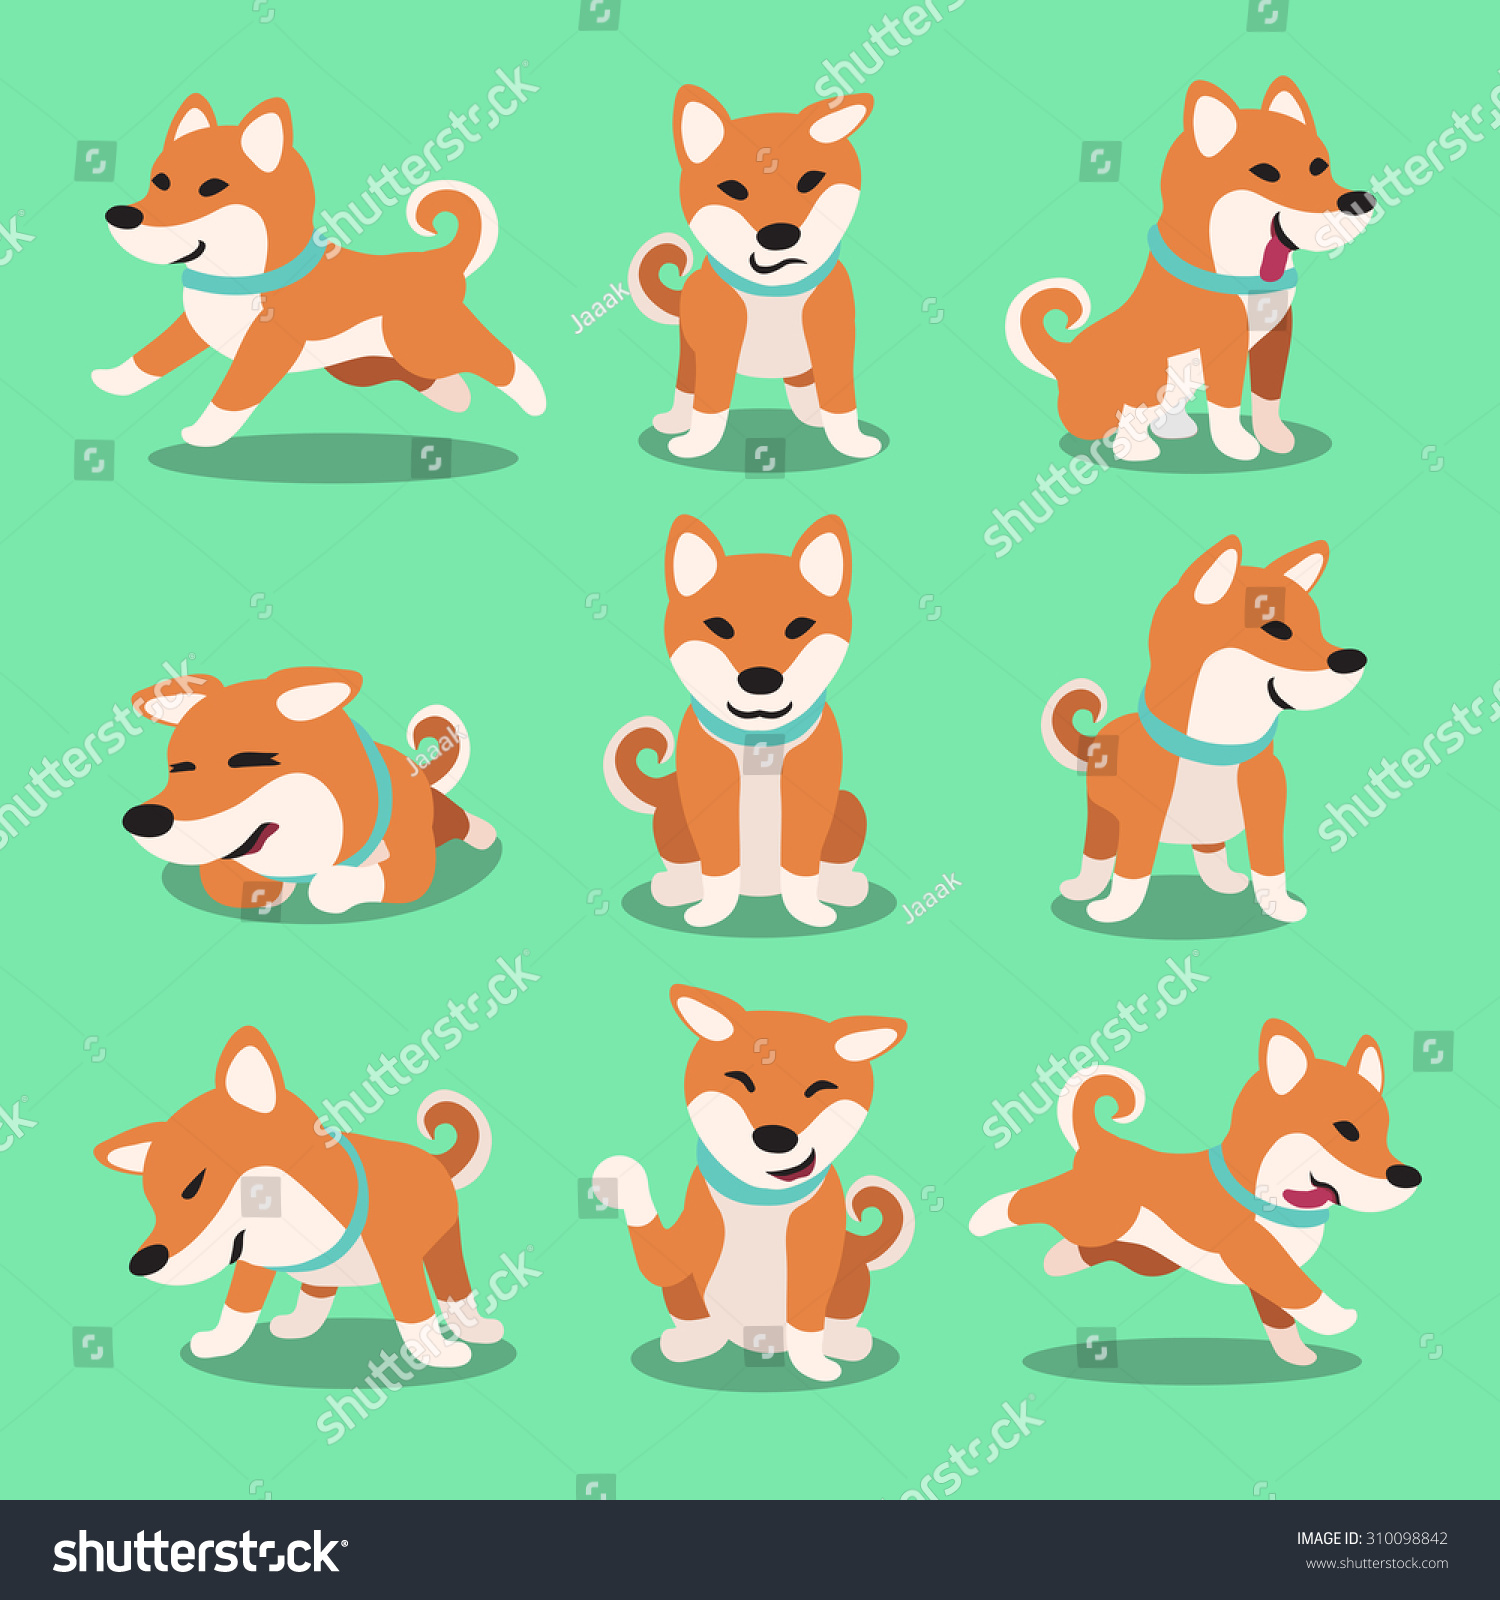 Shiba Inu Cute Desktop Wallpaper Cartoon Character Shiba Inu Dog Poses Stock Vector